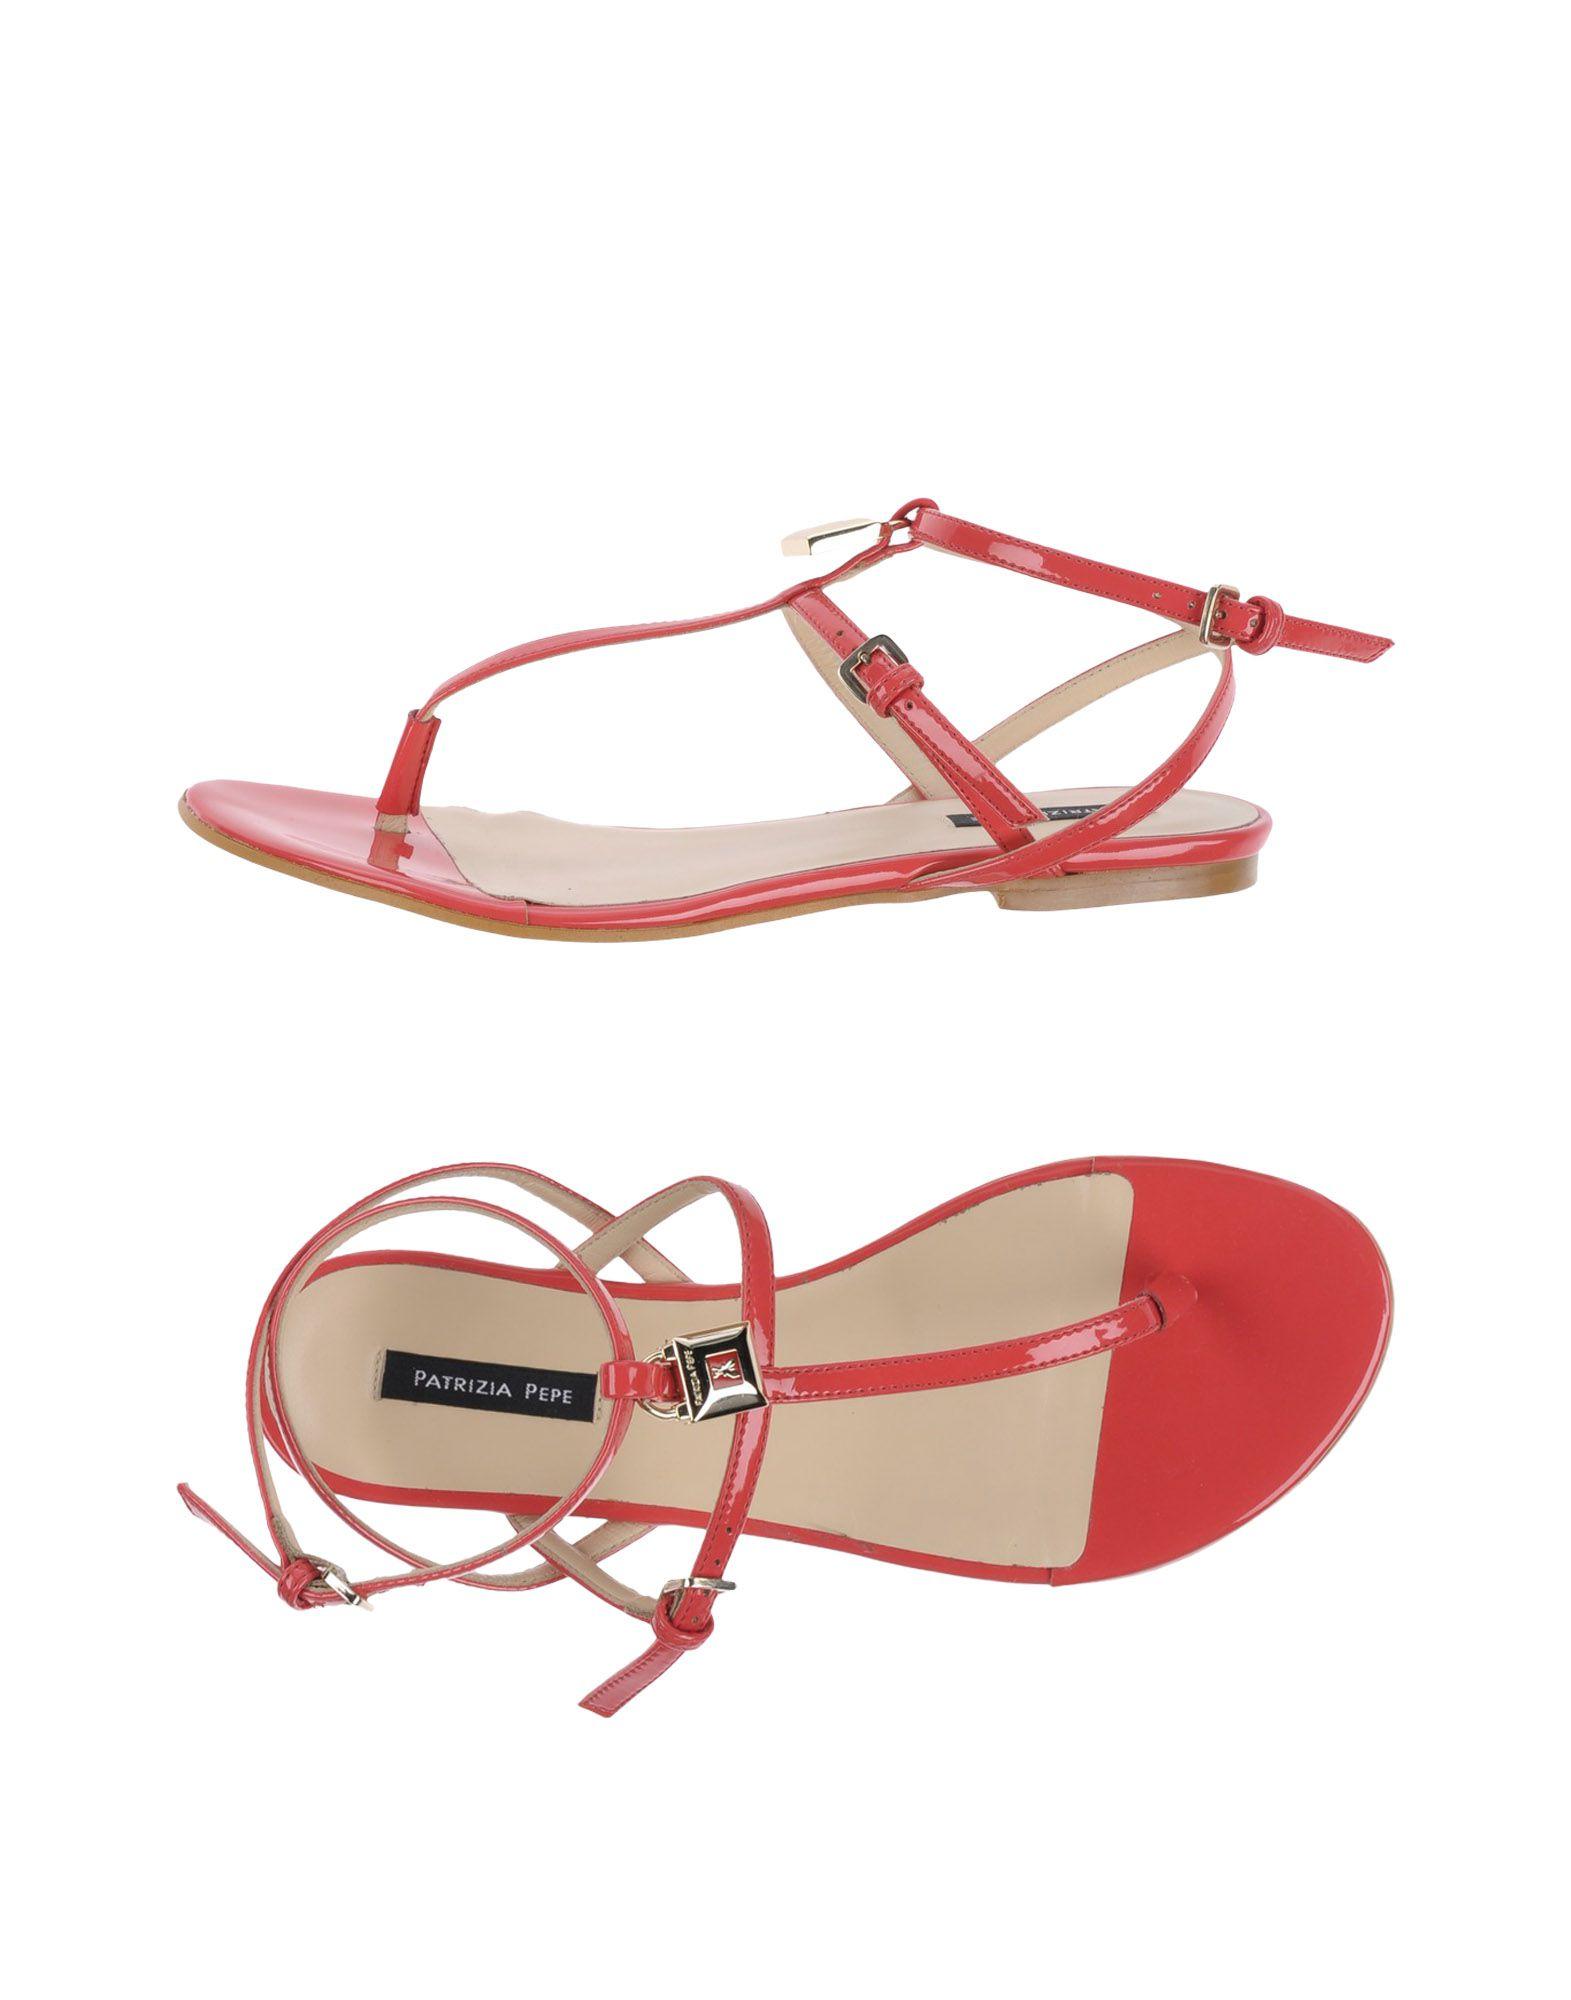 Patrizia Pepe Dianetten Damen  11143185BT Gute Qualität beliebte Schuhe